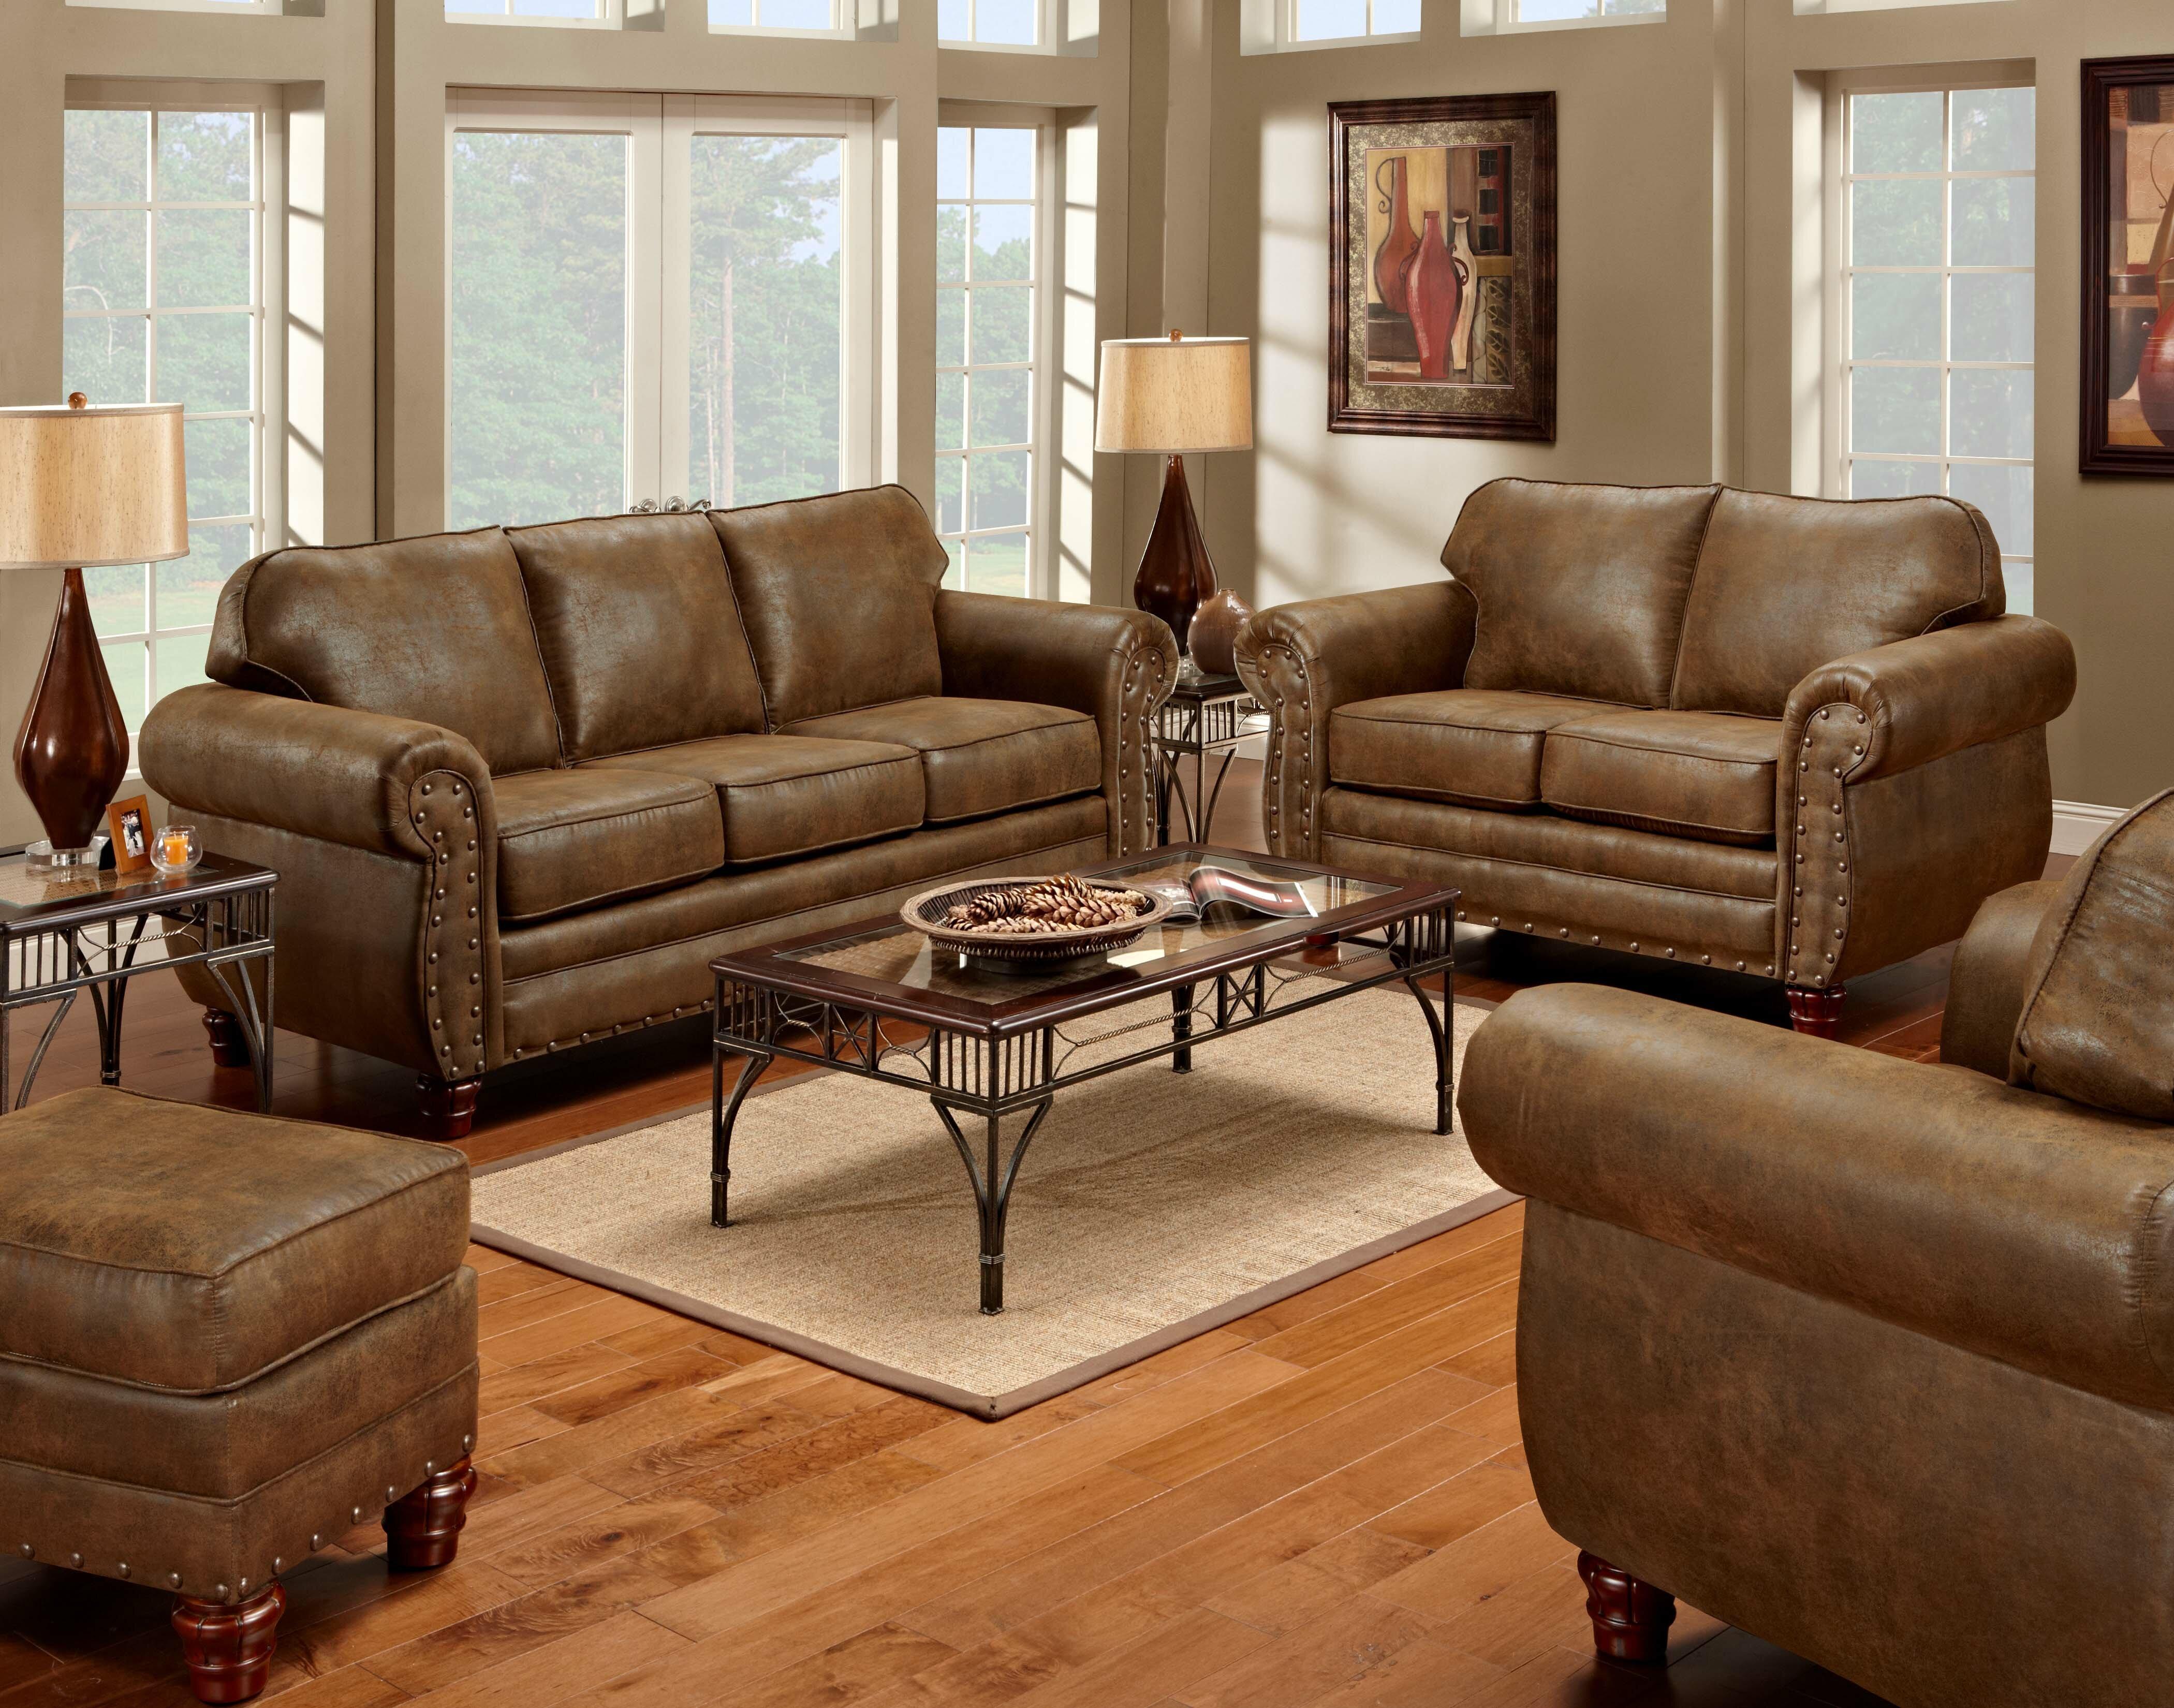 4 Piece Living Room Sets | Wayfair